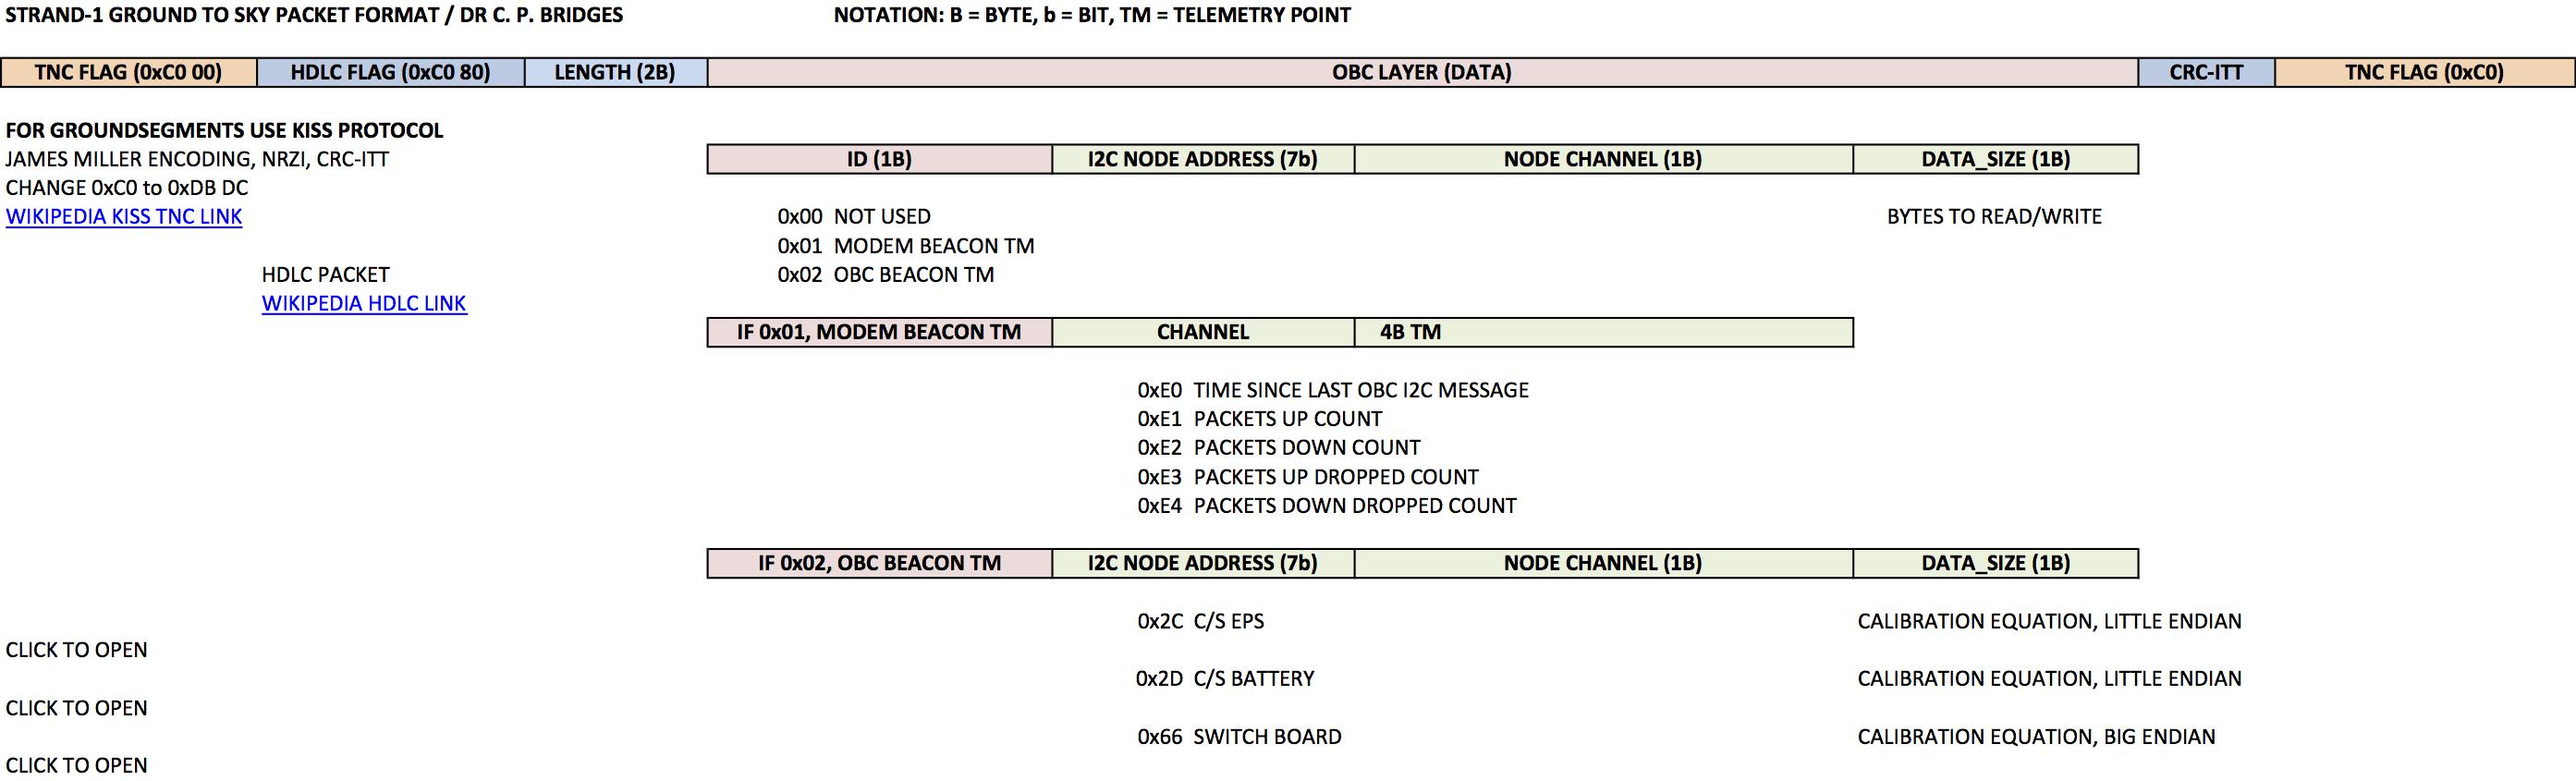 STRaND-1 Telemetry information